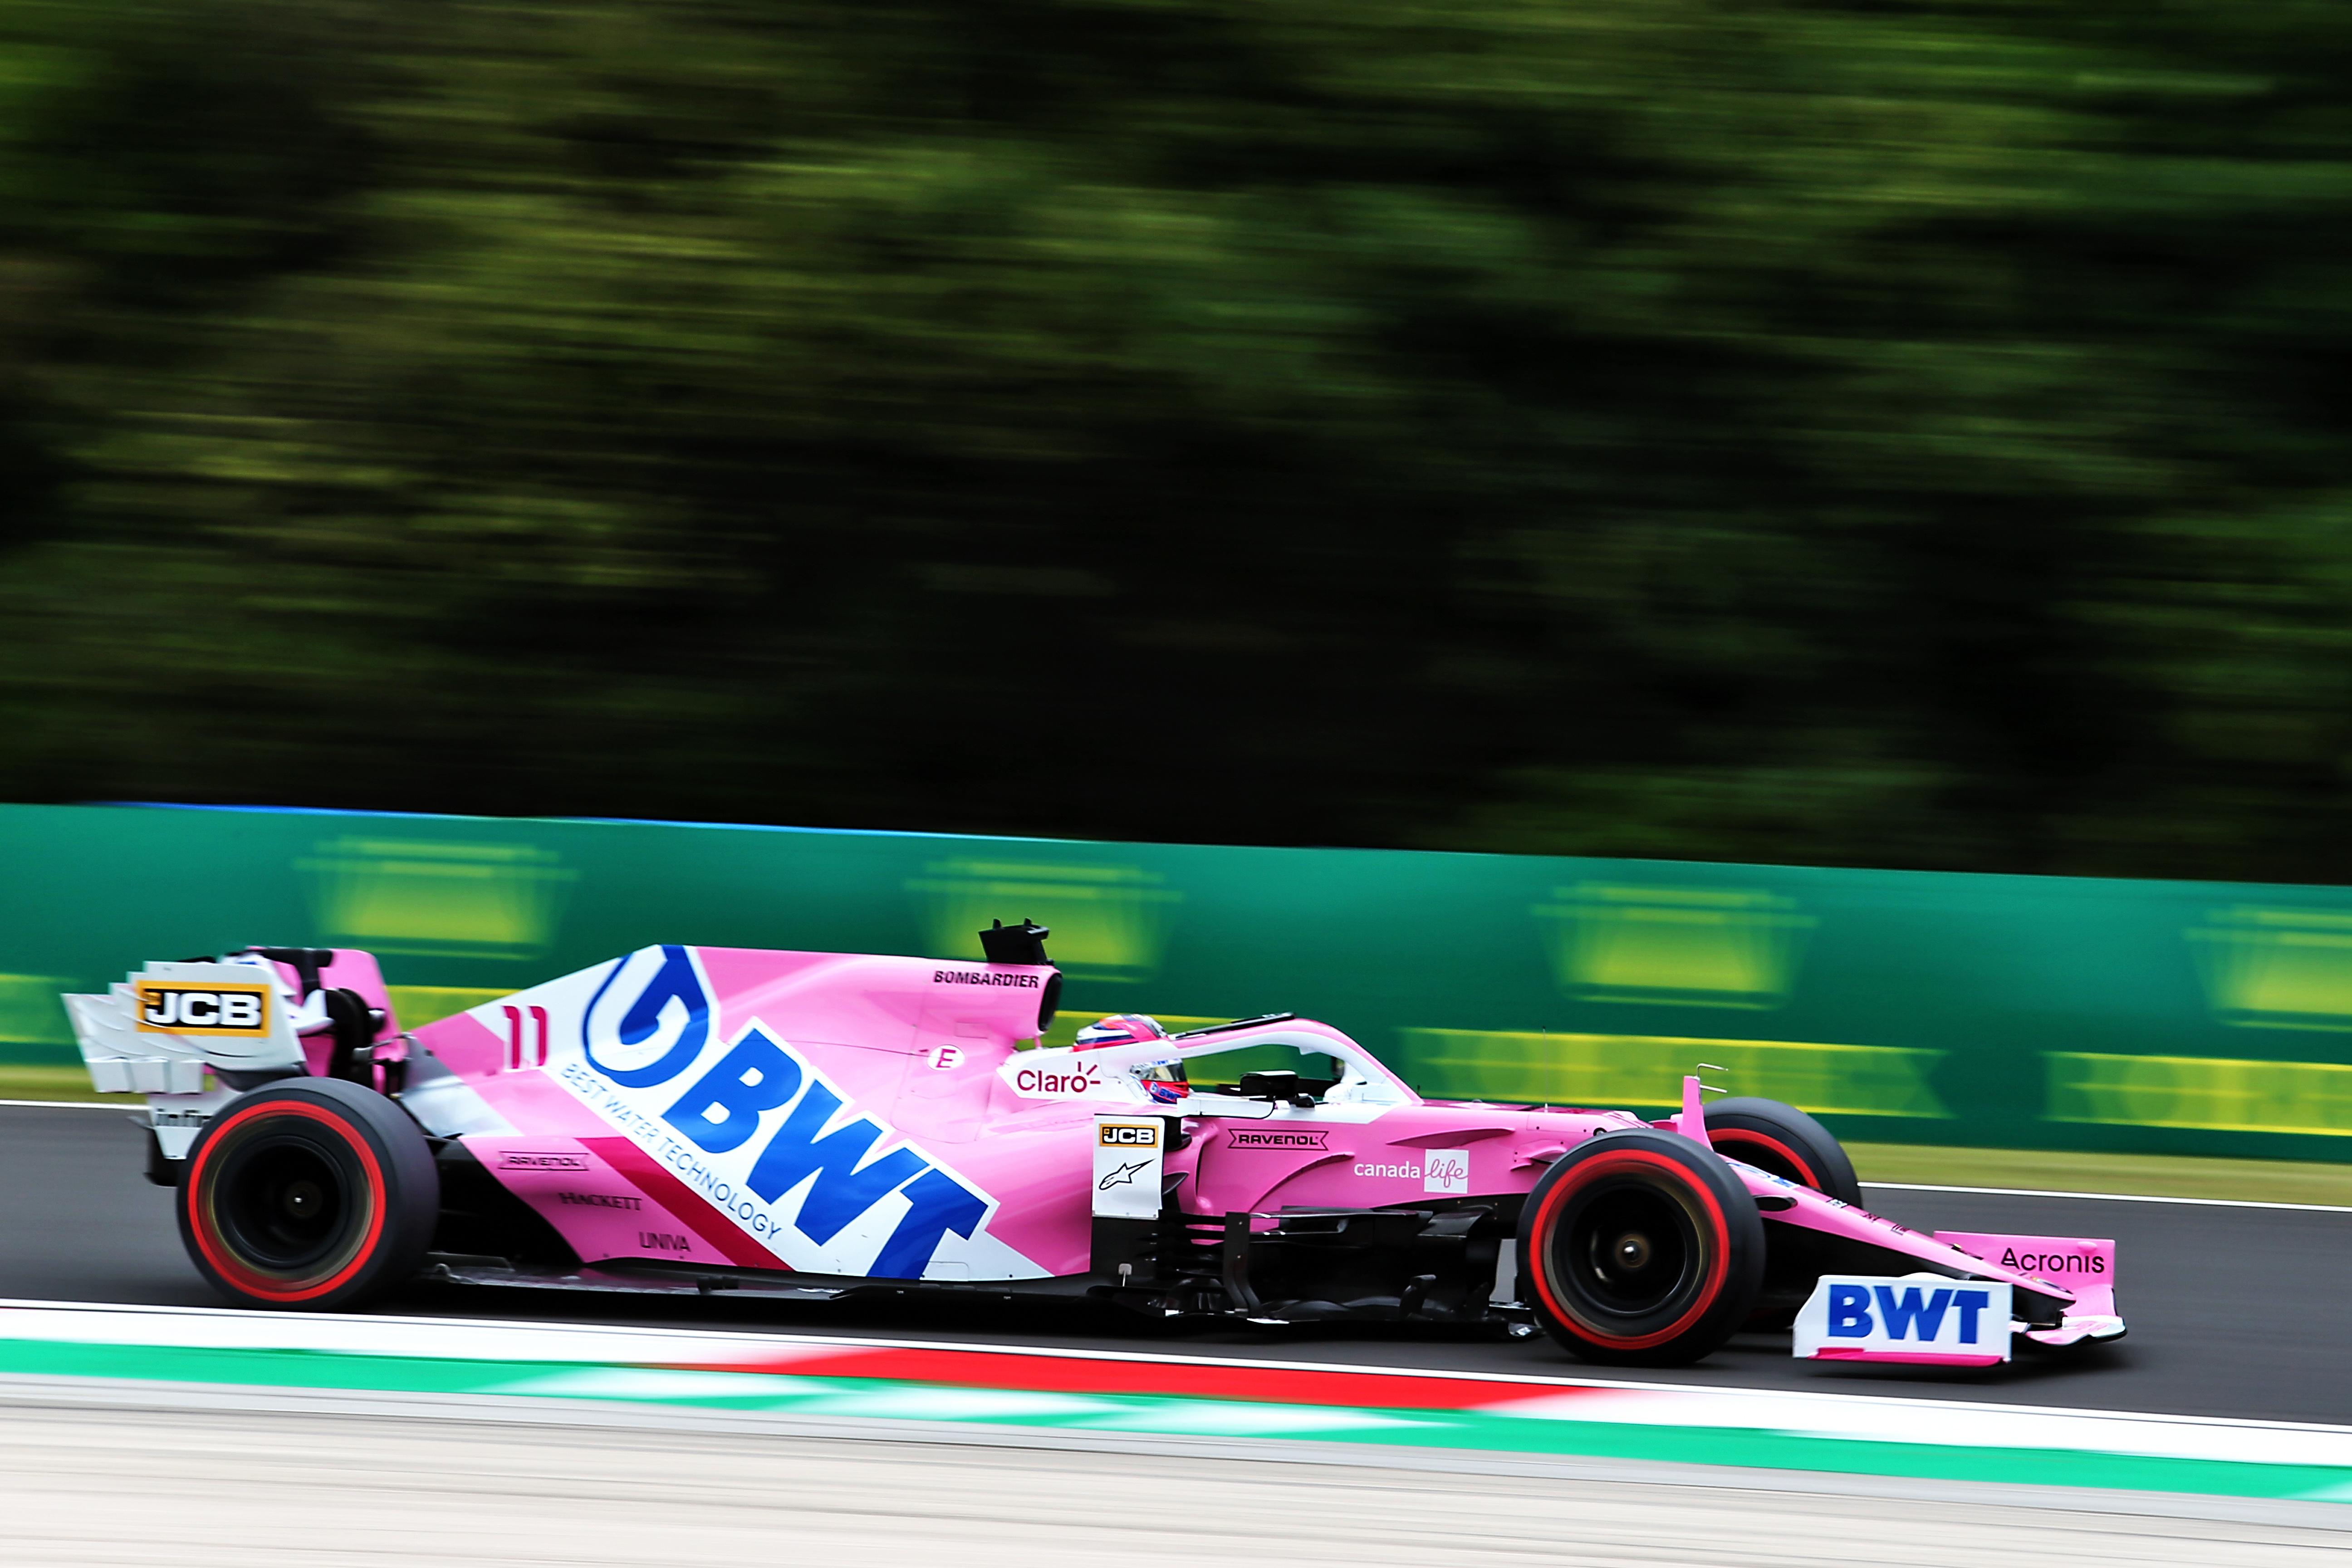 Sergio Perez Racing Point F1 2020